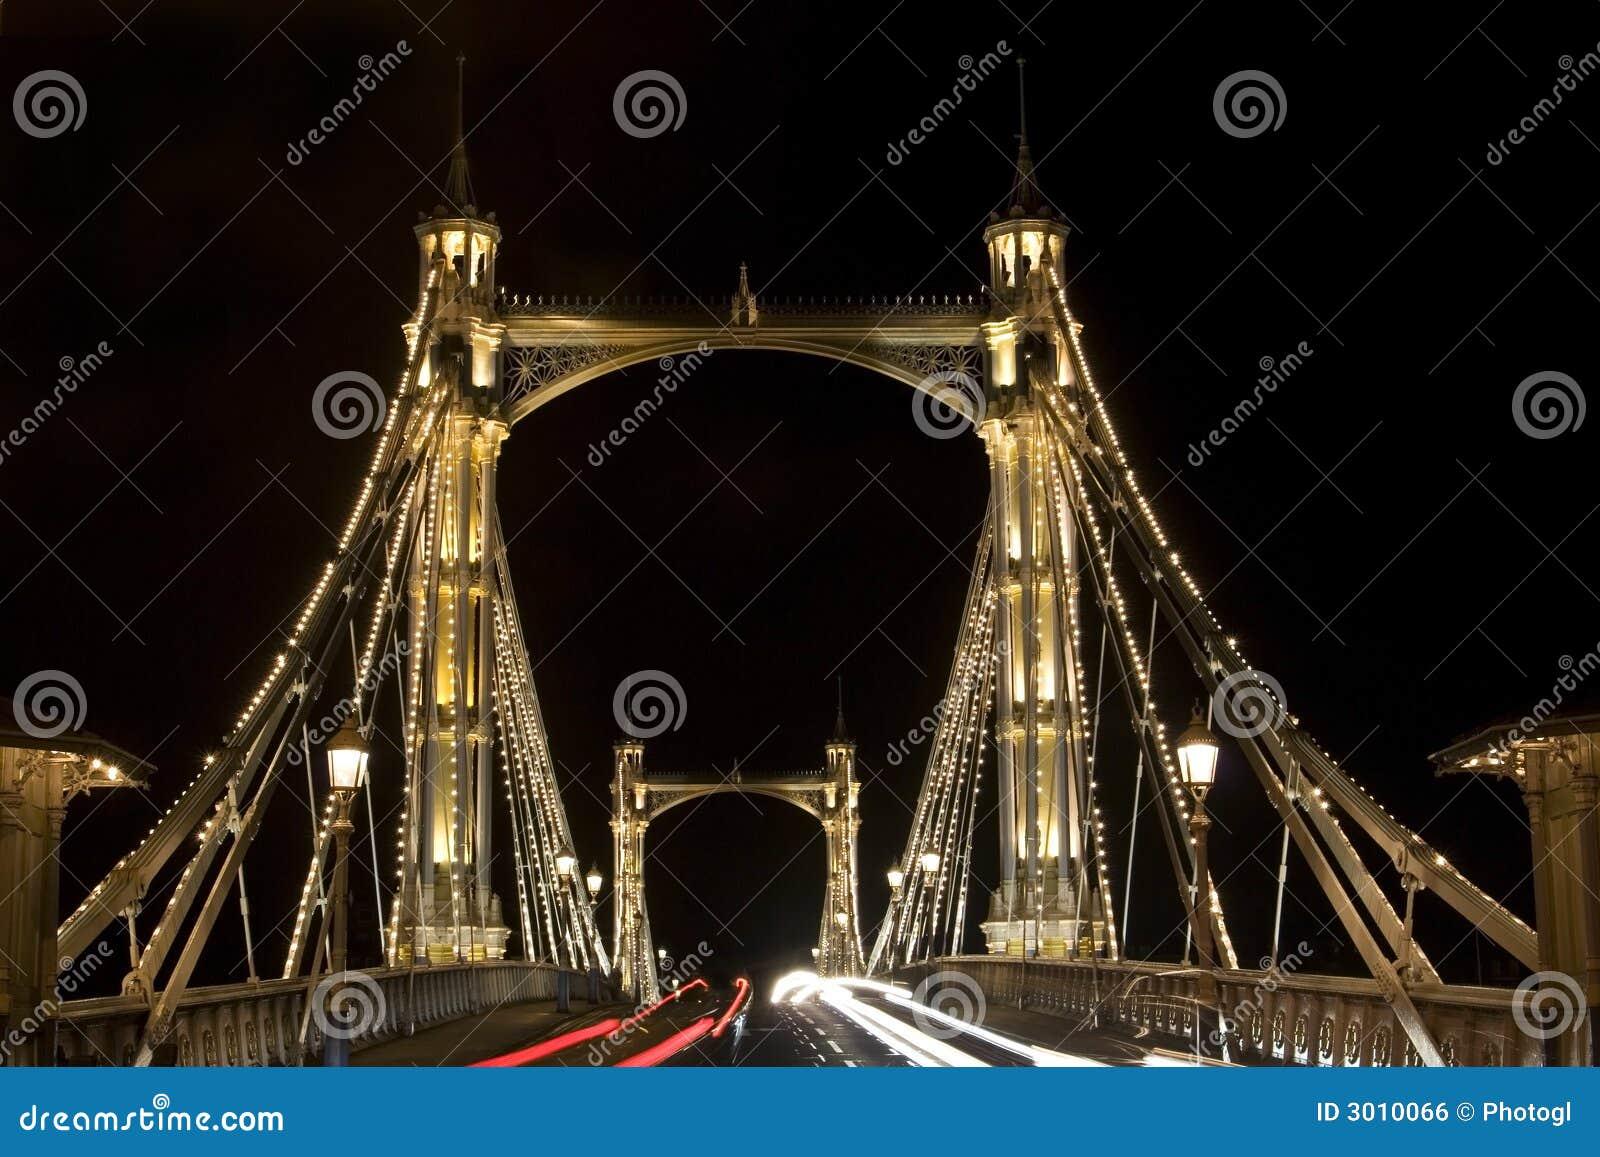 Albert Bridge in London. Night